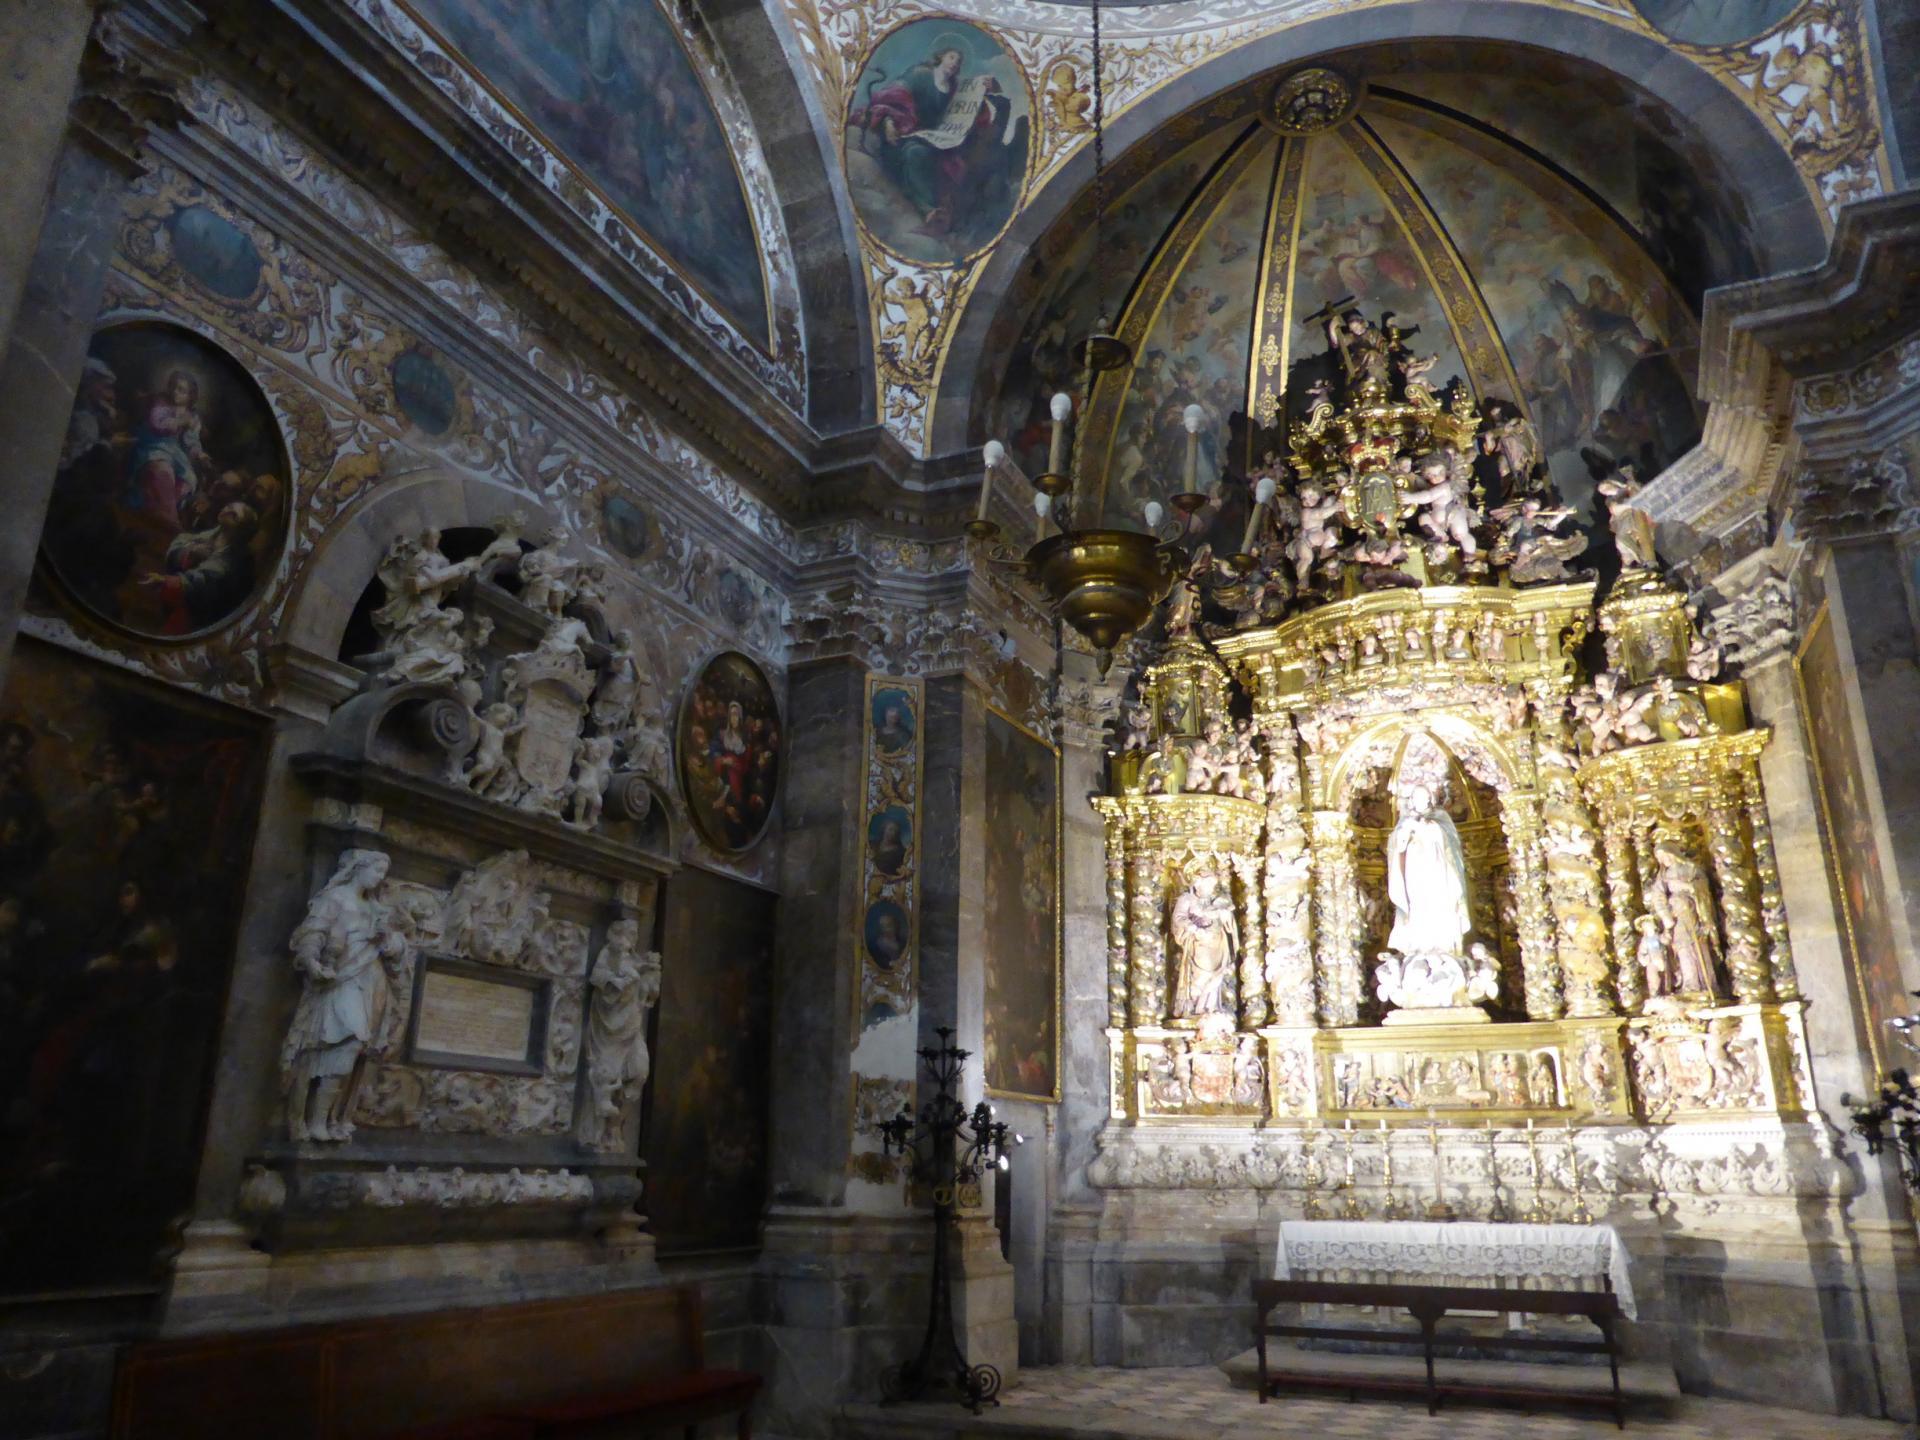 Tarragone, cathédrale, chapelle latérale, XVIIe siècle, cl. Ph. Cachau